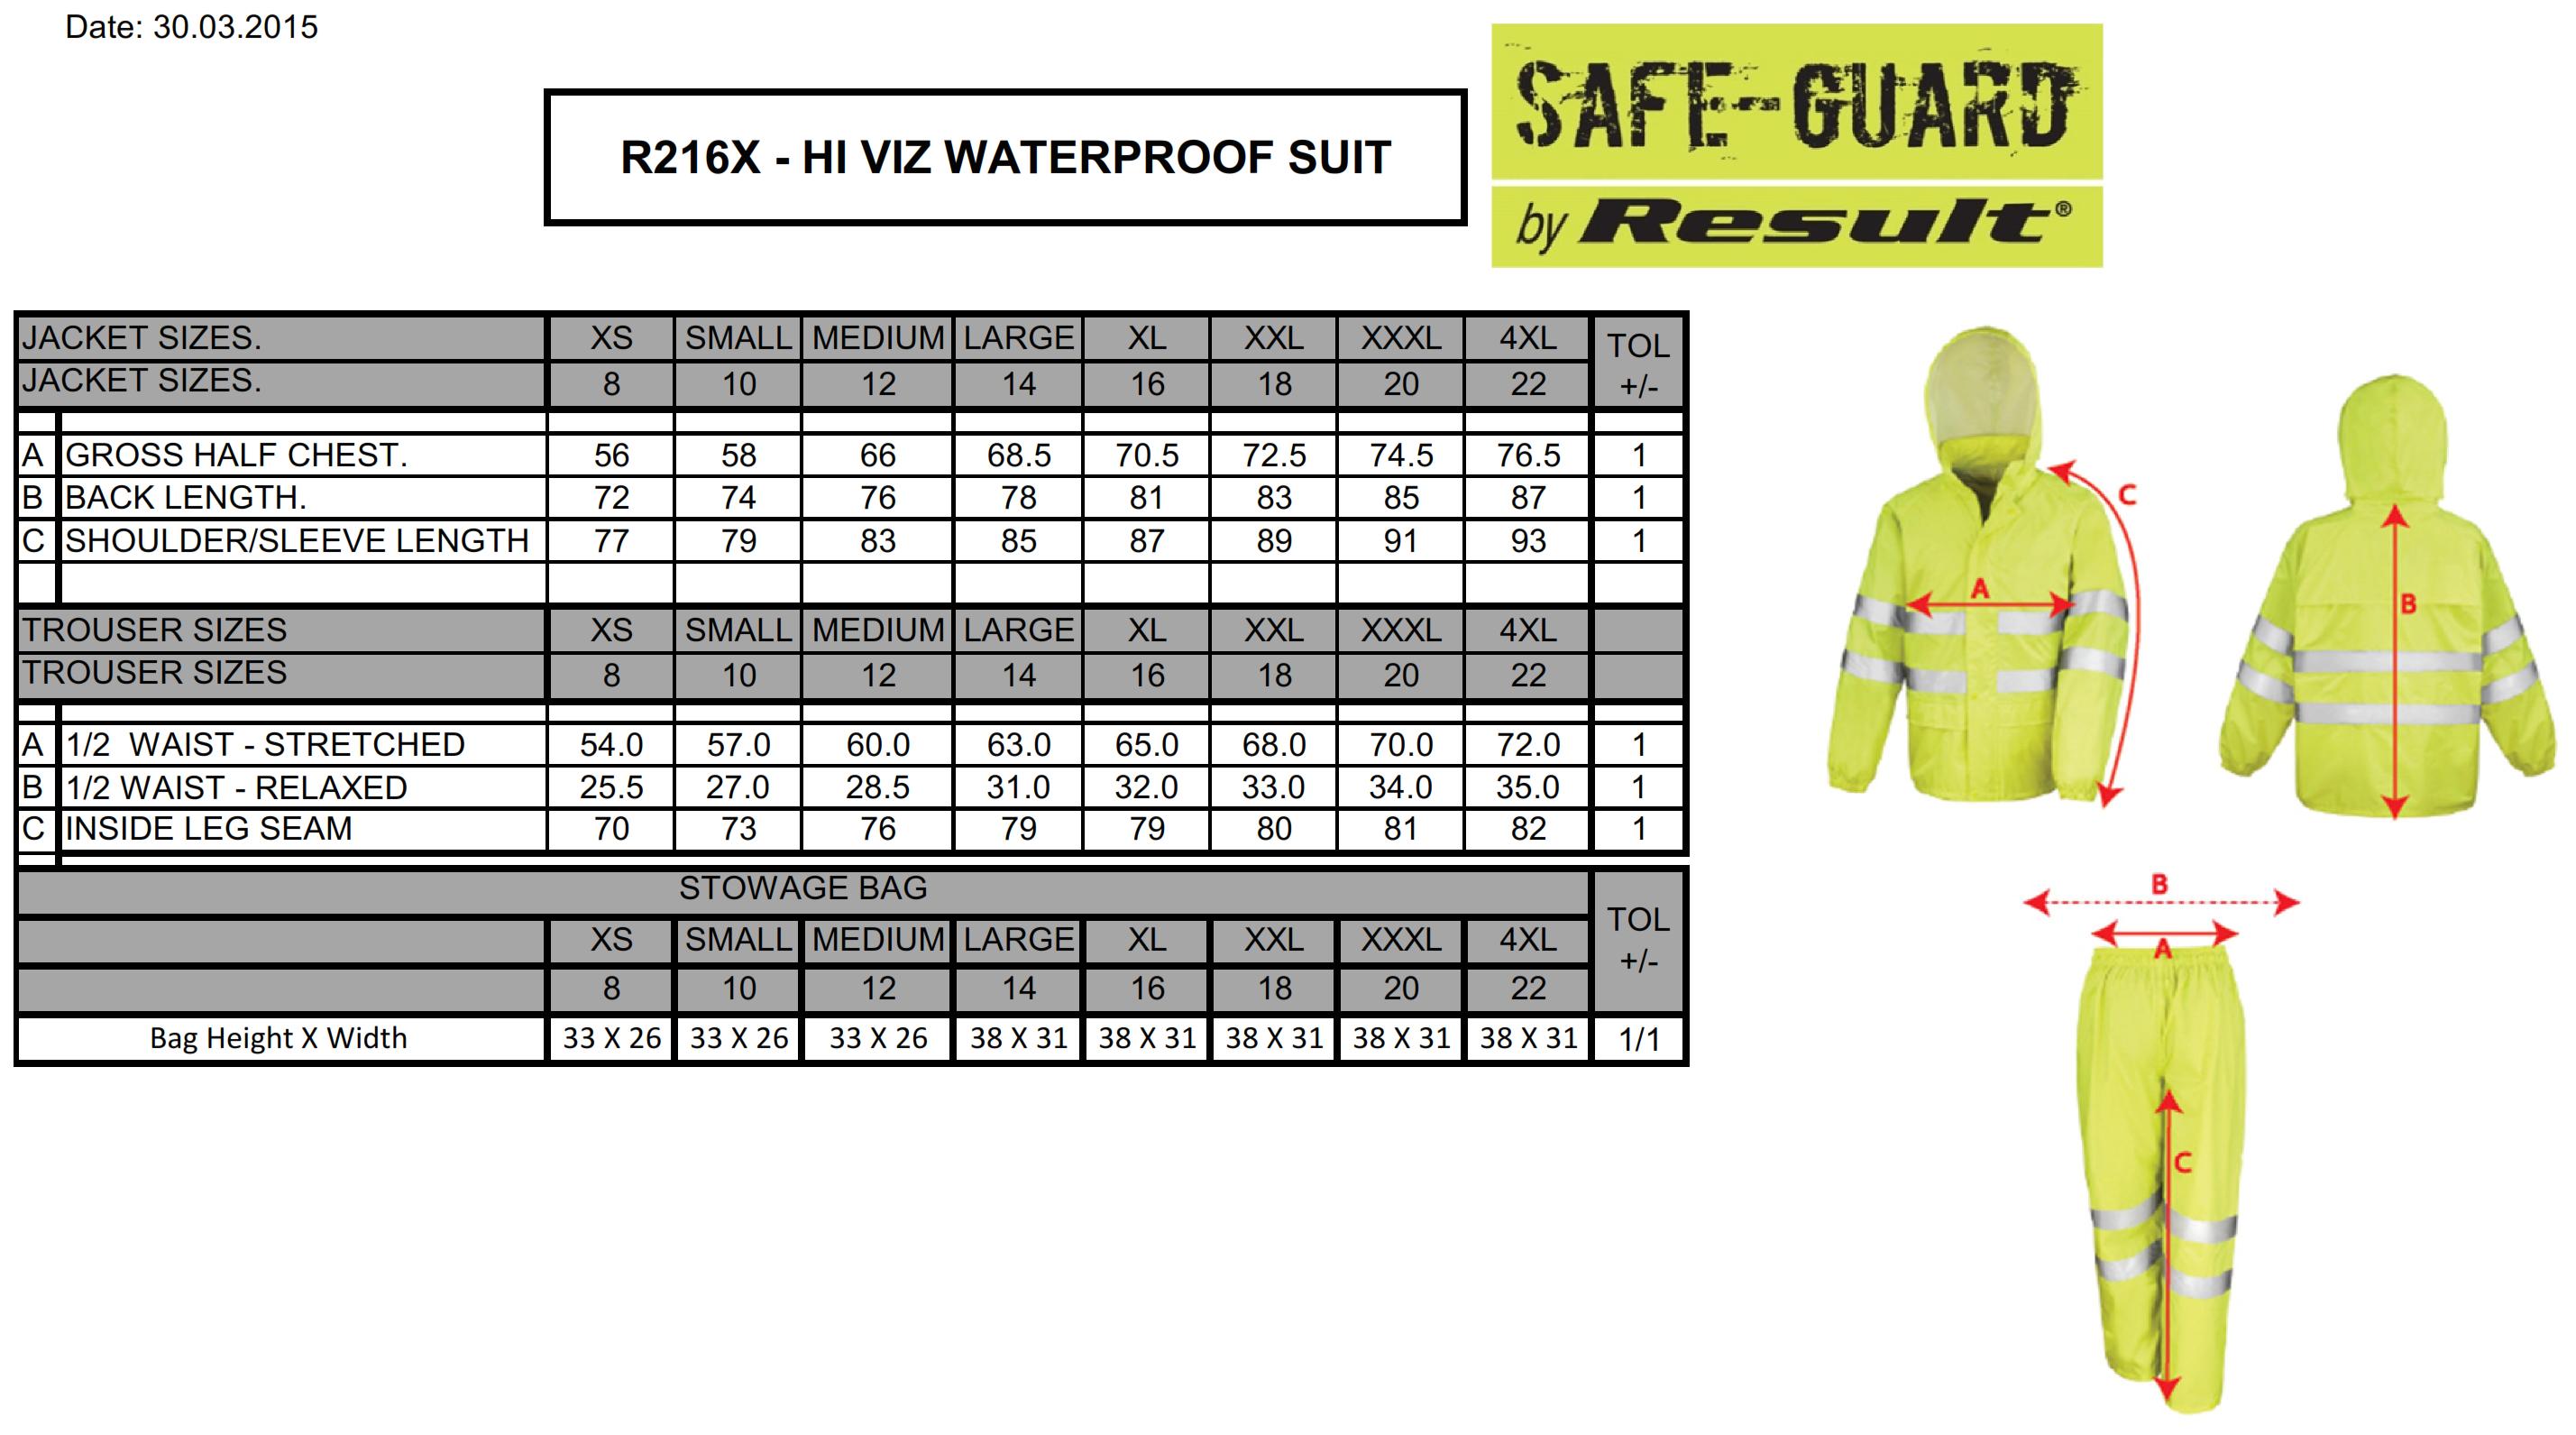 Result: High Viz Waterproof Suit R216X